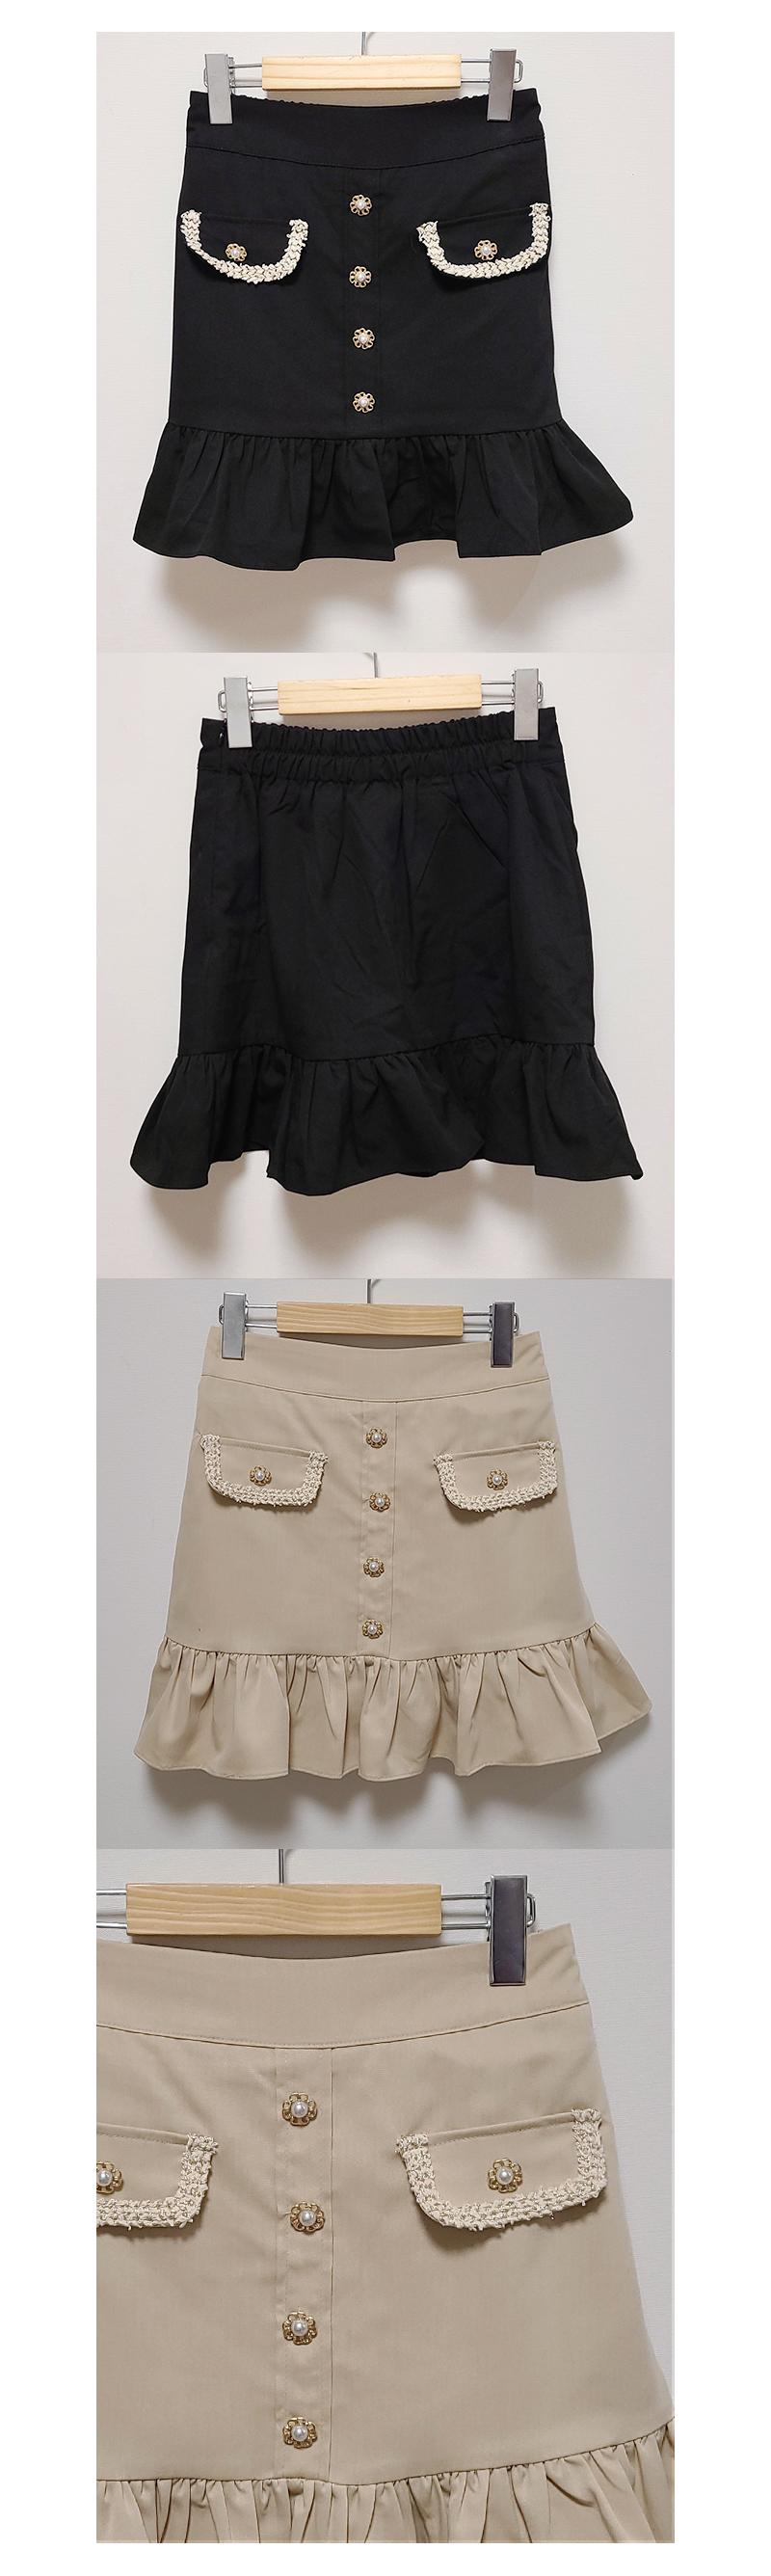 Linda jewelry skirt pants